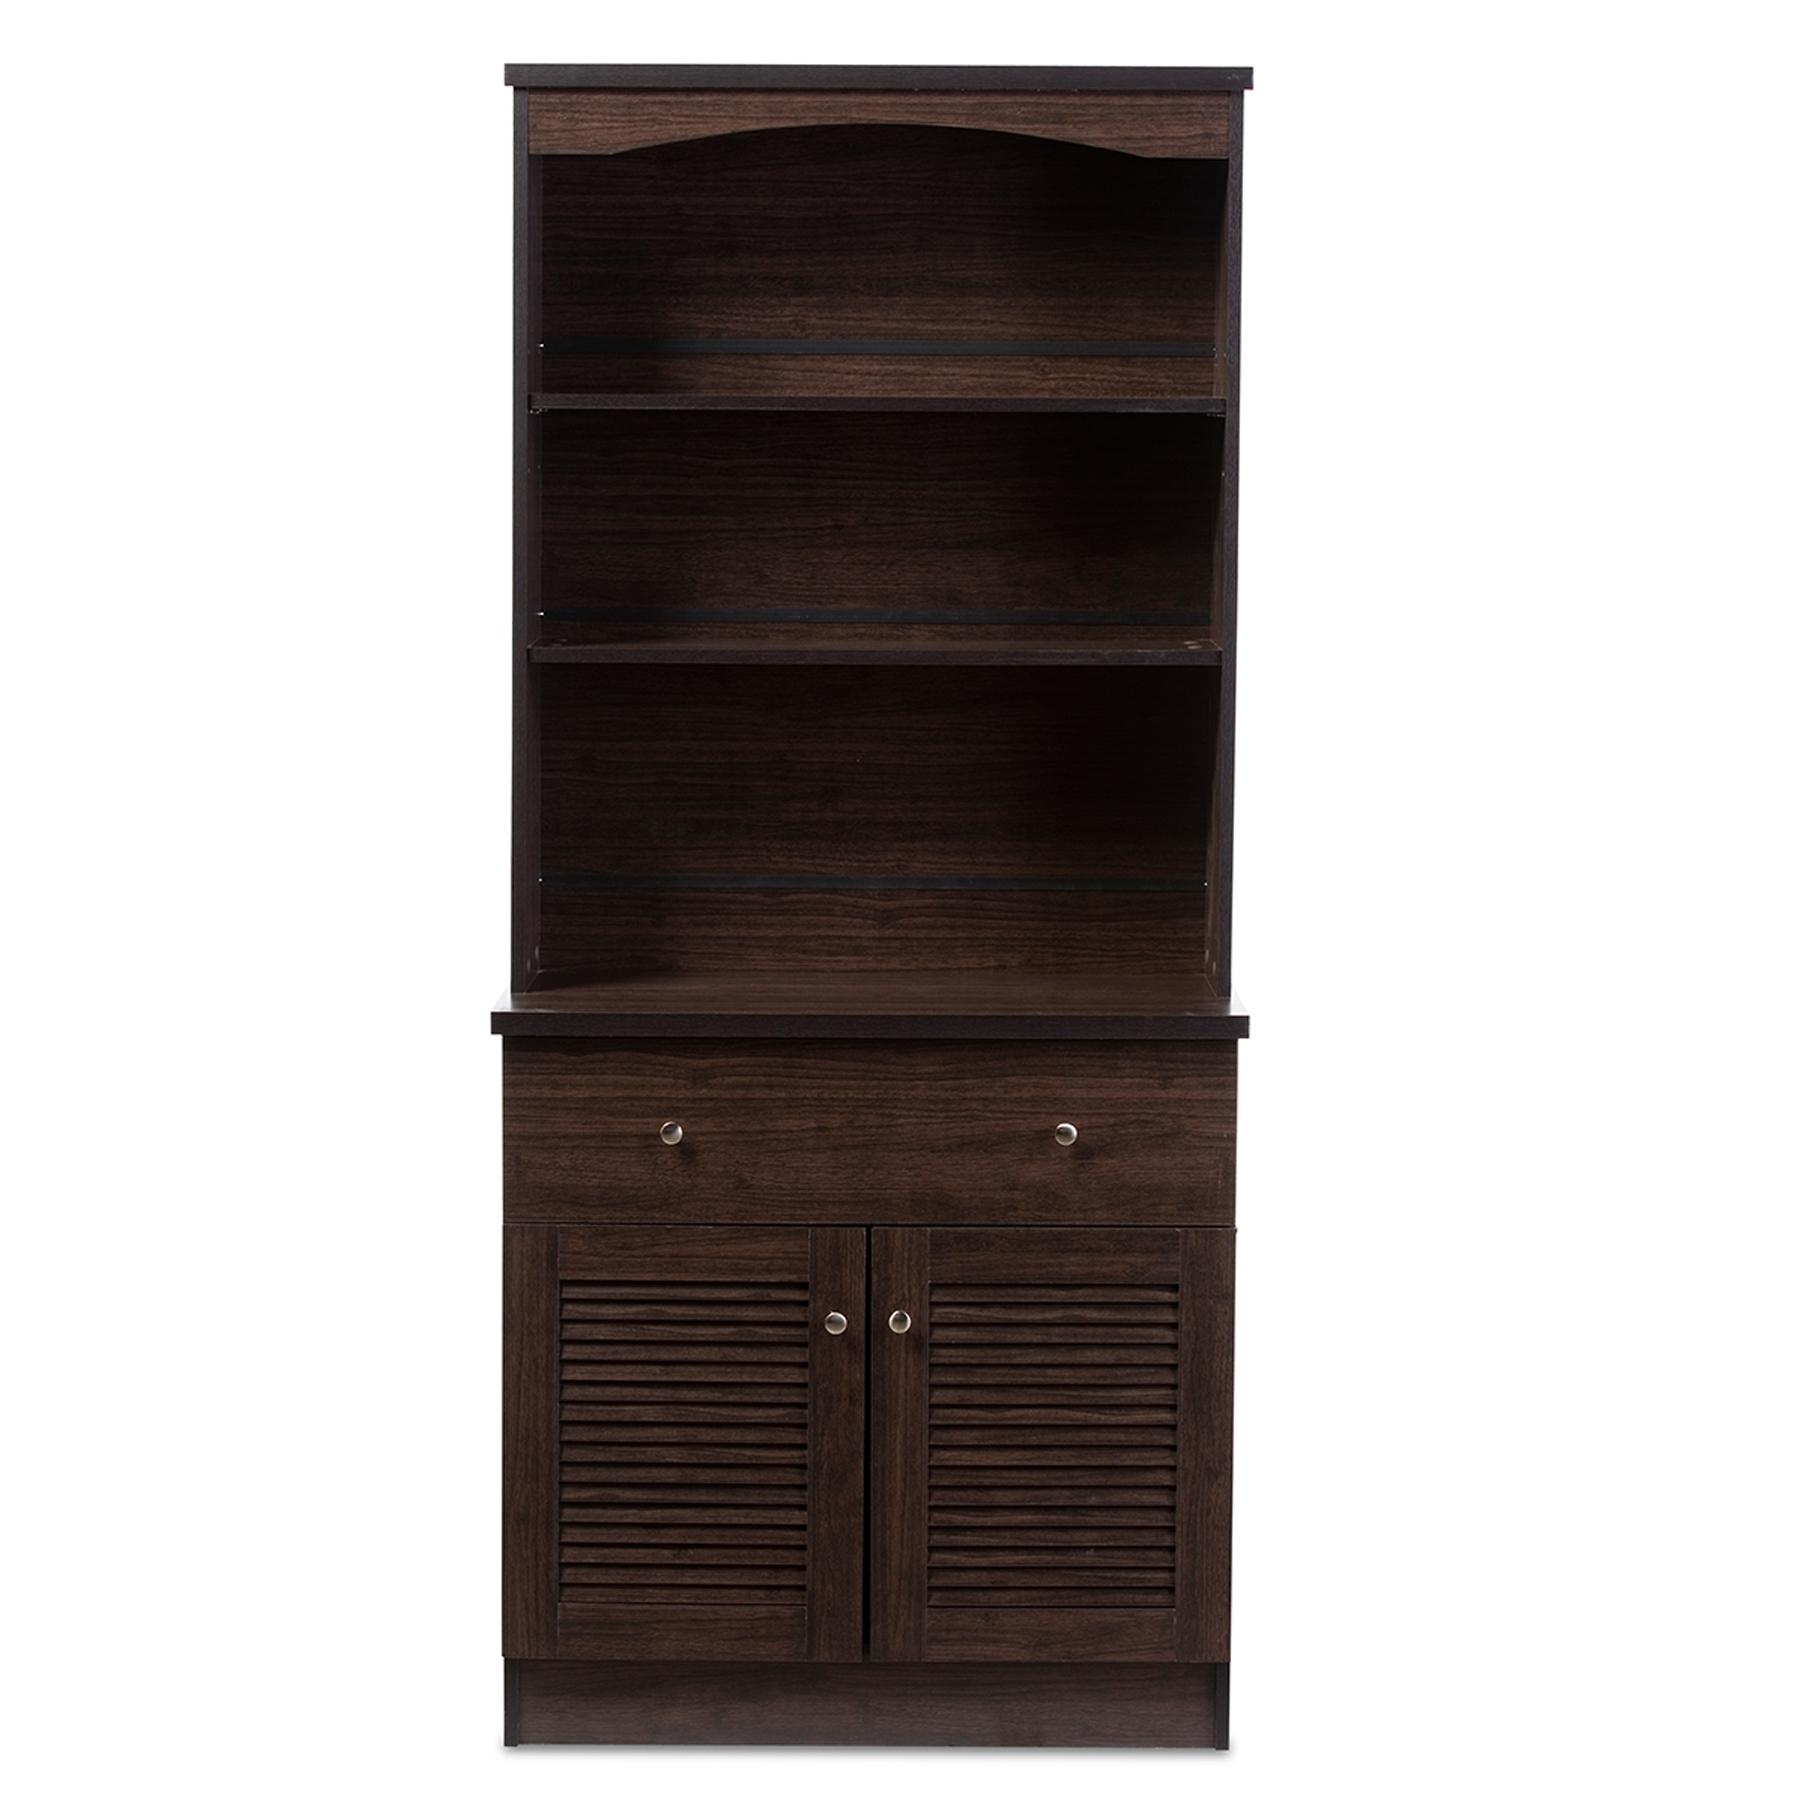 Wenge Wood Kitchen Cabinets Wholesale Kitchen Cabinets China Decor Small Kitchen With